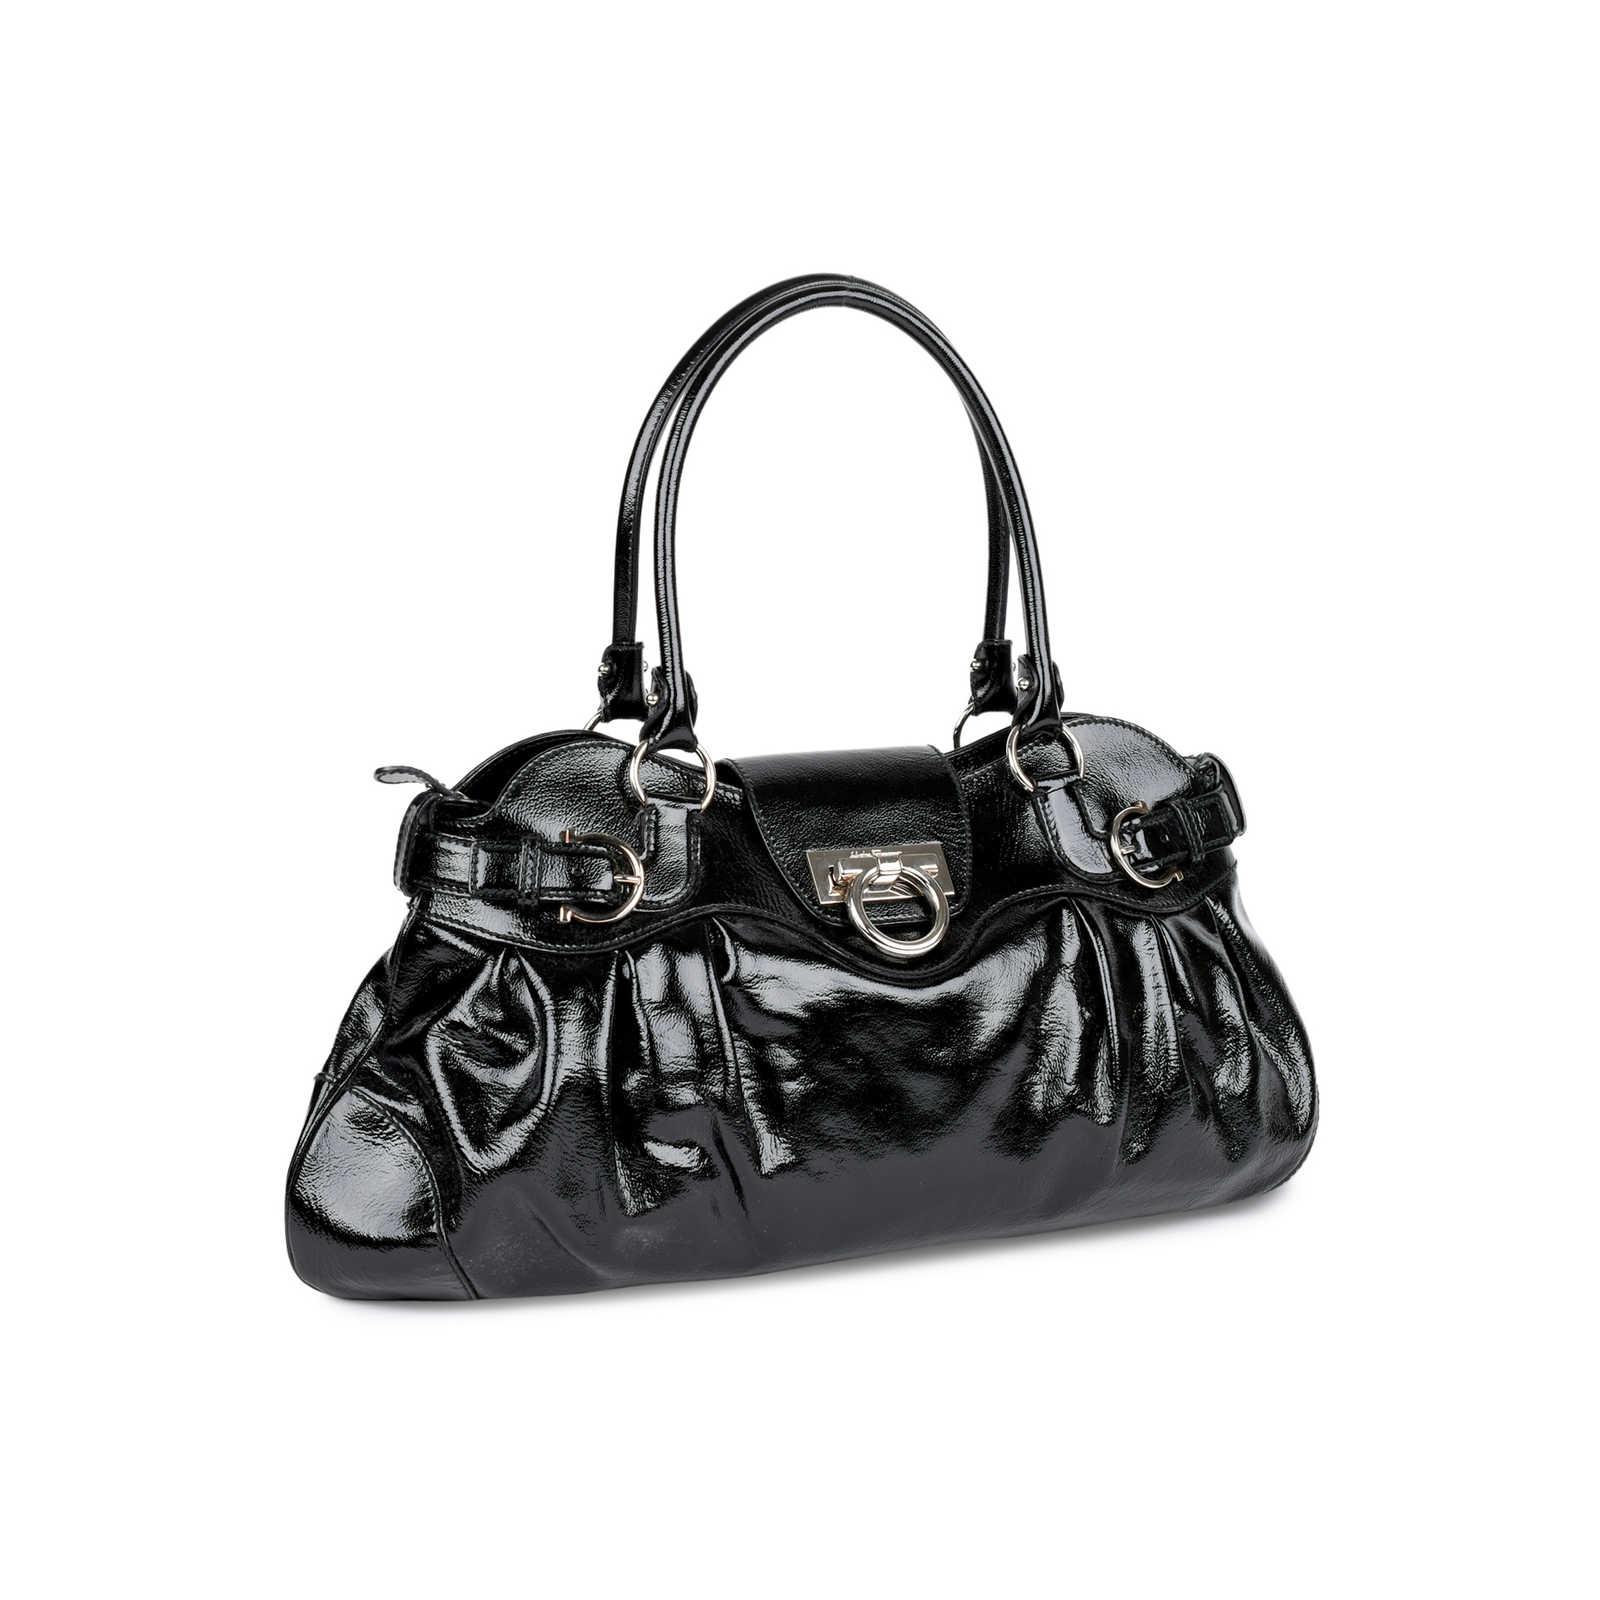 1c909de856e5 ... Authentic Second Hand Salvatore Ferragamo Marisa Shoulder Bag  (PSS-460-00009) ...